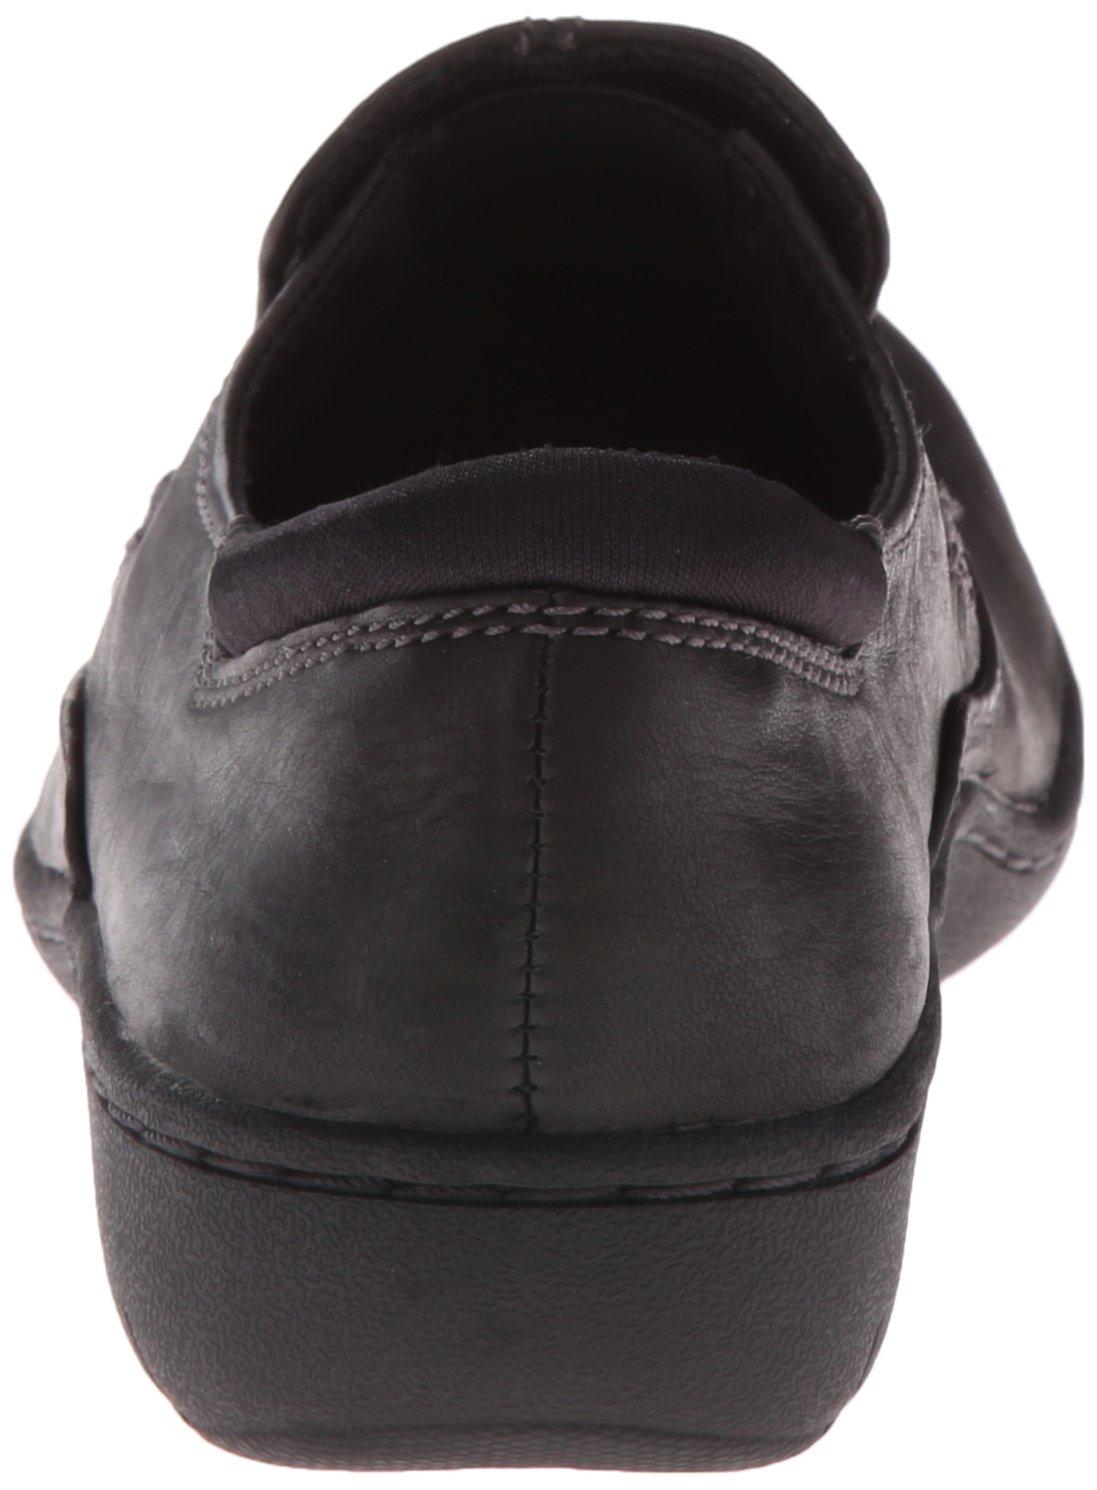 Skechers Women's Washington Closure Slip-On Loafer B00XNS7BGC 8 B(M) US|Black Closure